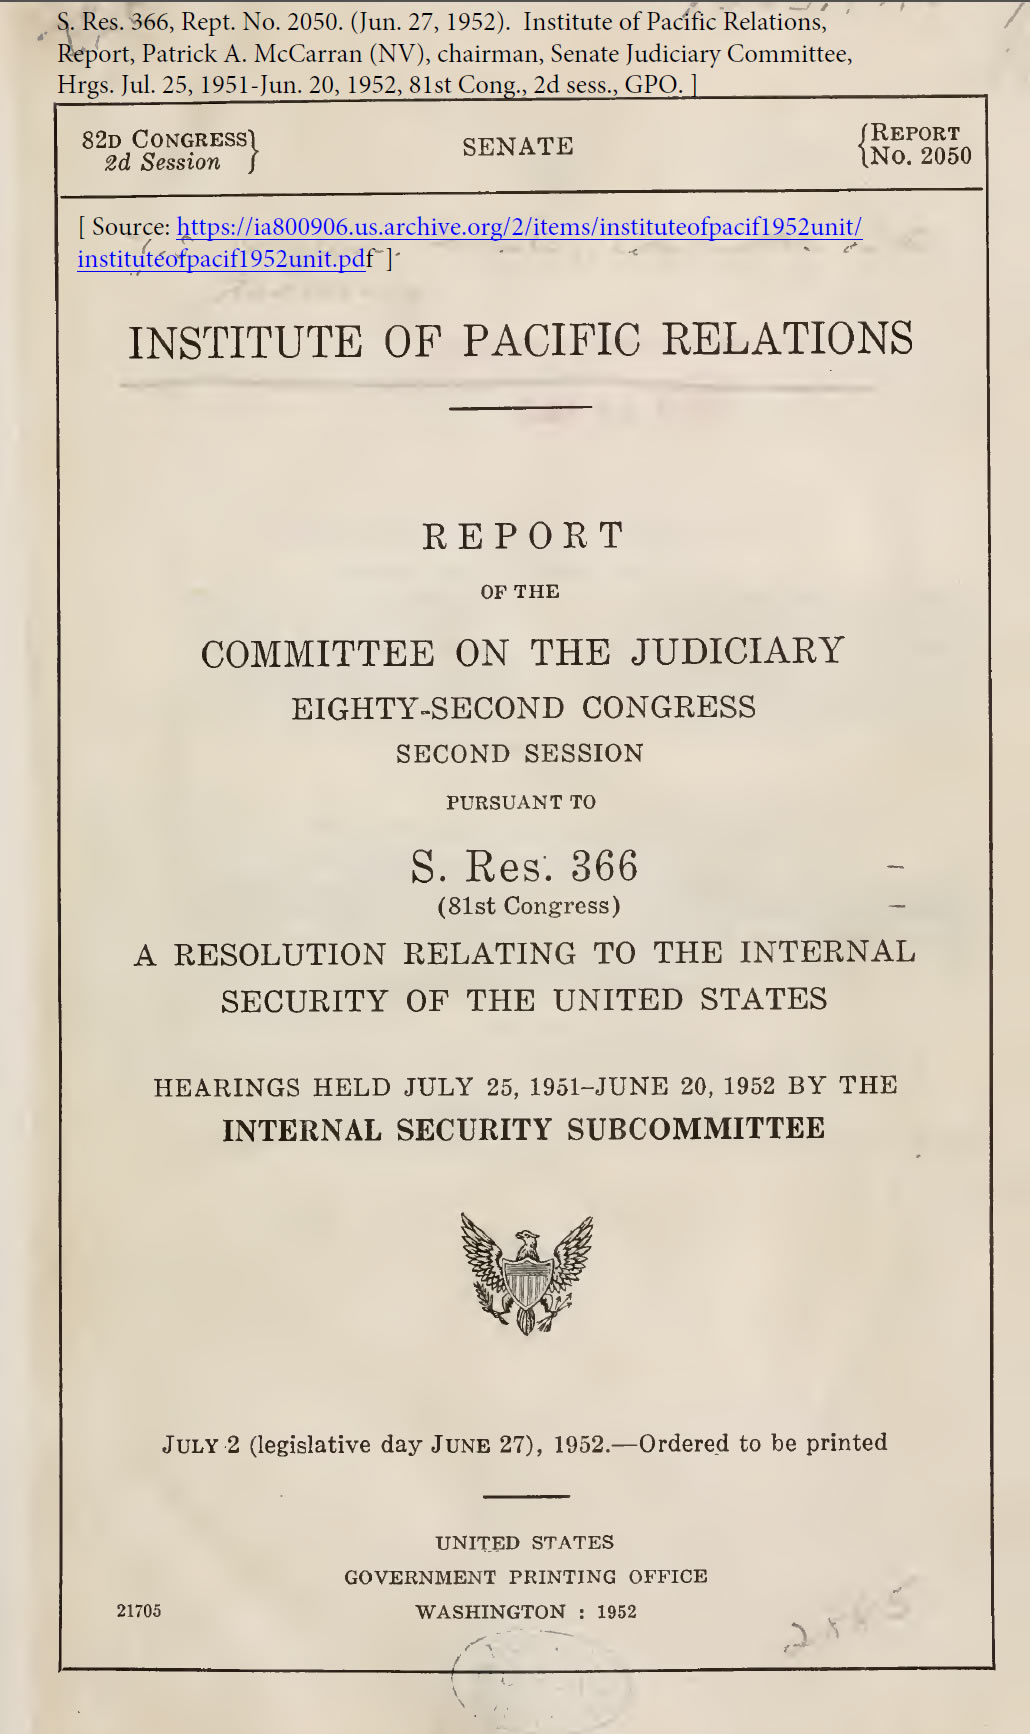 S. Res. 366, Rept. No. 2050. (Jun. 27, 1952). Institute of Pacific Relations, Report, Patrick A. McCarran (NV), chairman, Senate Judiciary Committee, Hrgs. Jul. 25, 1951-Jun. 20, 1952, 81st Cong., 2d sess., GPO.